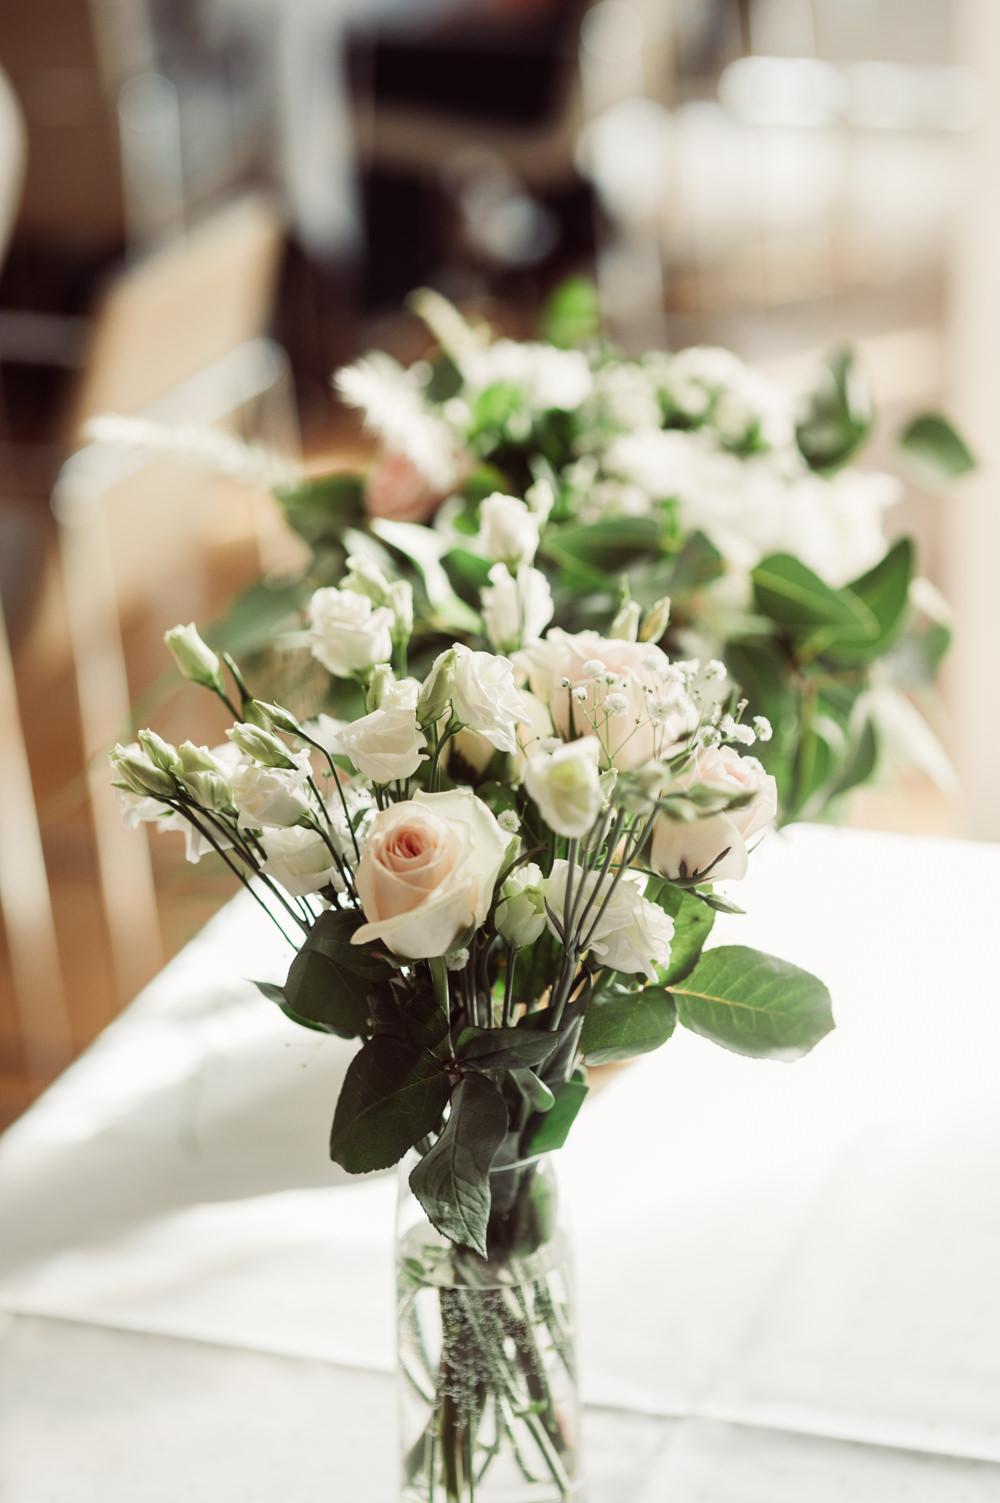 Flowers Table Centrepiece Rose Peony Greenery Foliage Norway Wedding Maximilian Photography